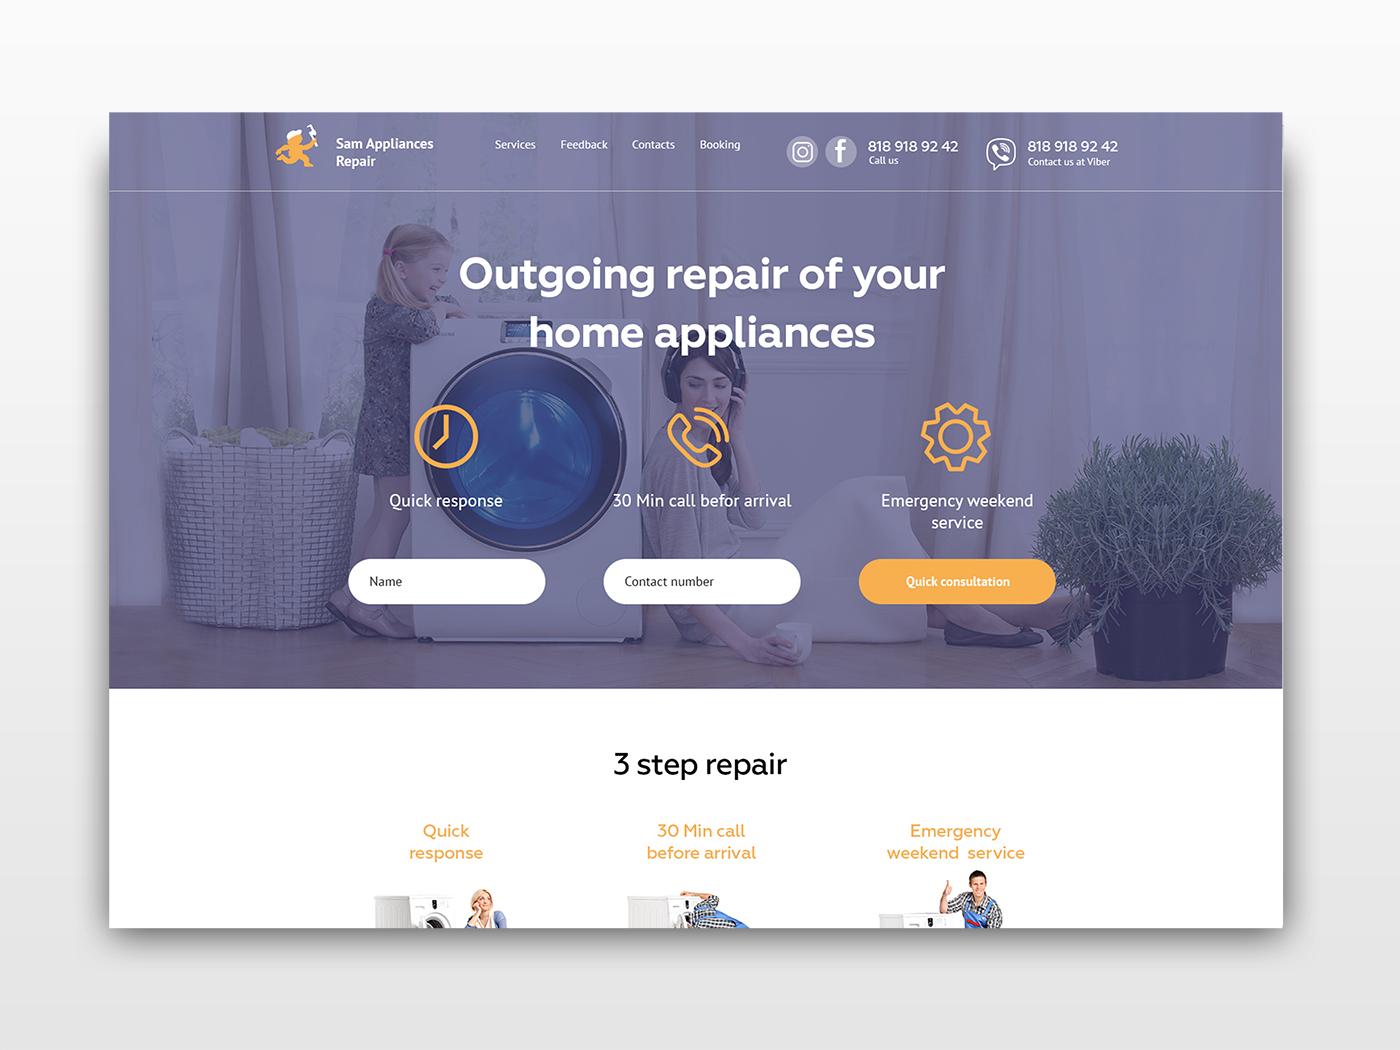 Sam Appliances Repair